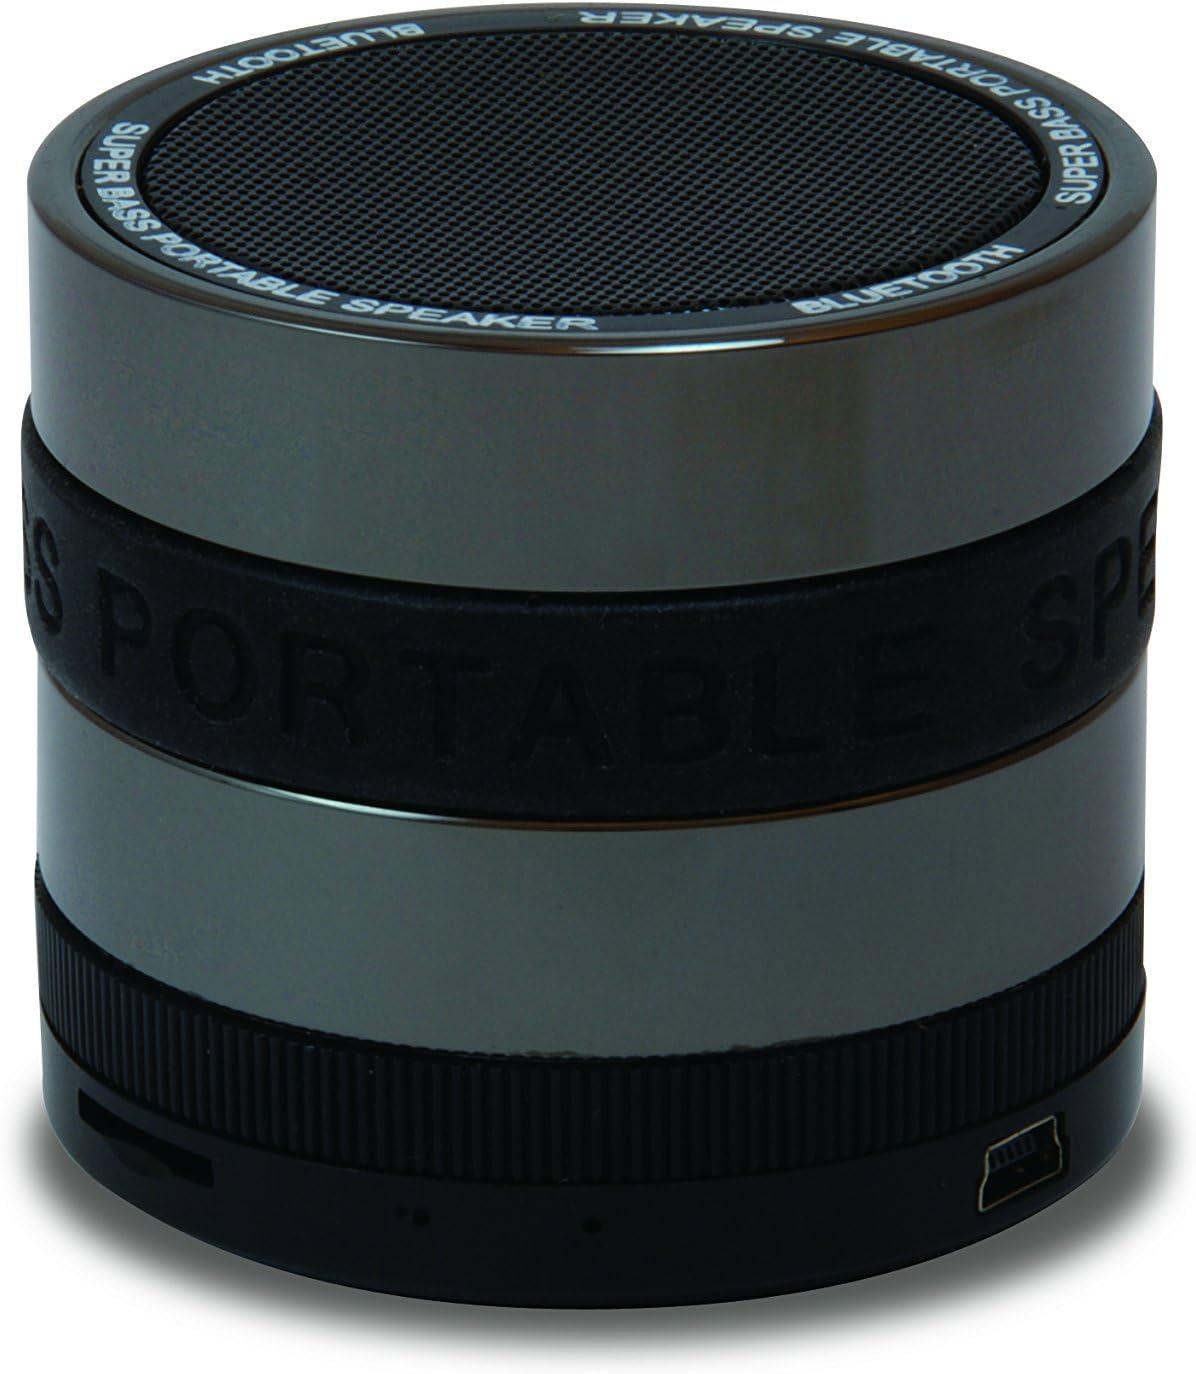 Conceptronic CSPKBTSBB 3 W Negro, Gris - Altavoces portátiles (3 W, 85 dB, 0,5%, Inalámbrico y alámbrico, 10 m, Mini-USB)